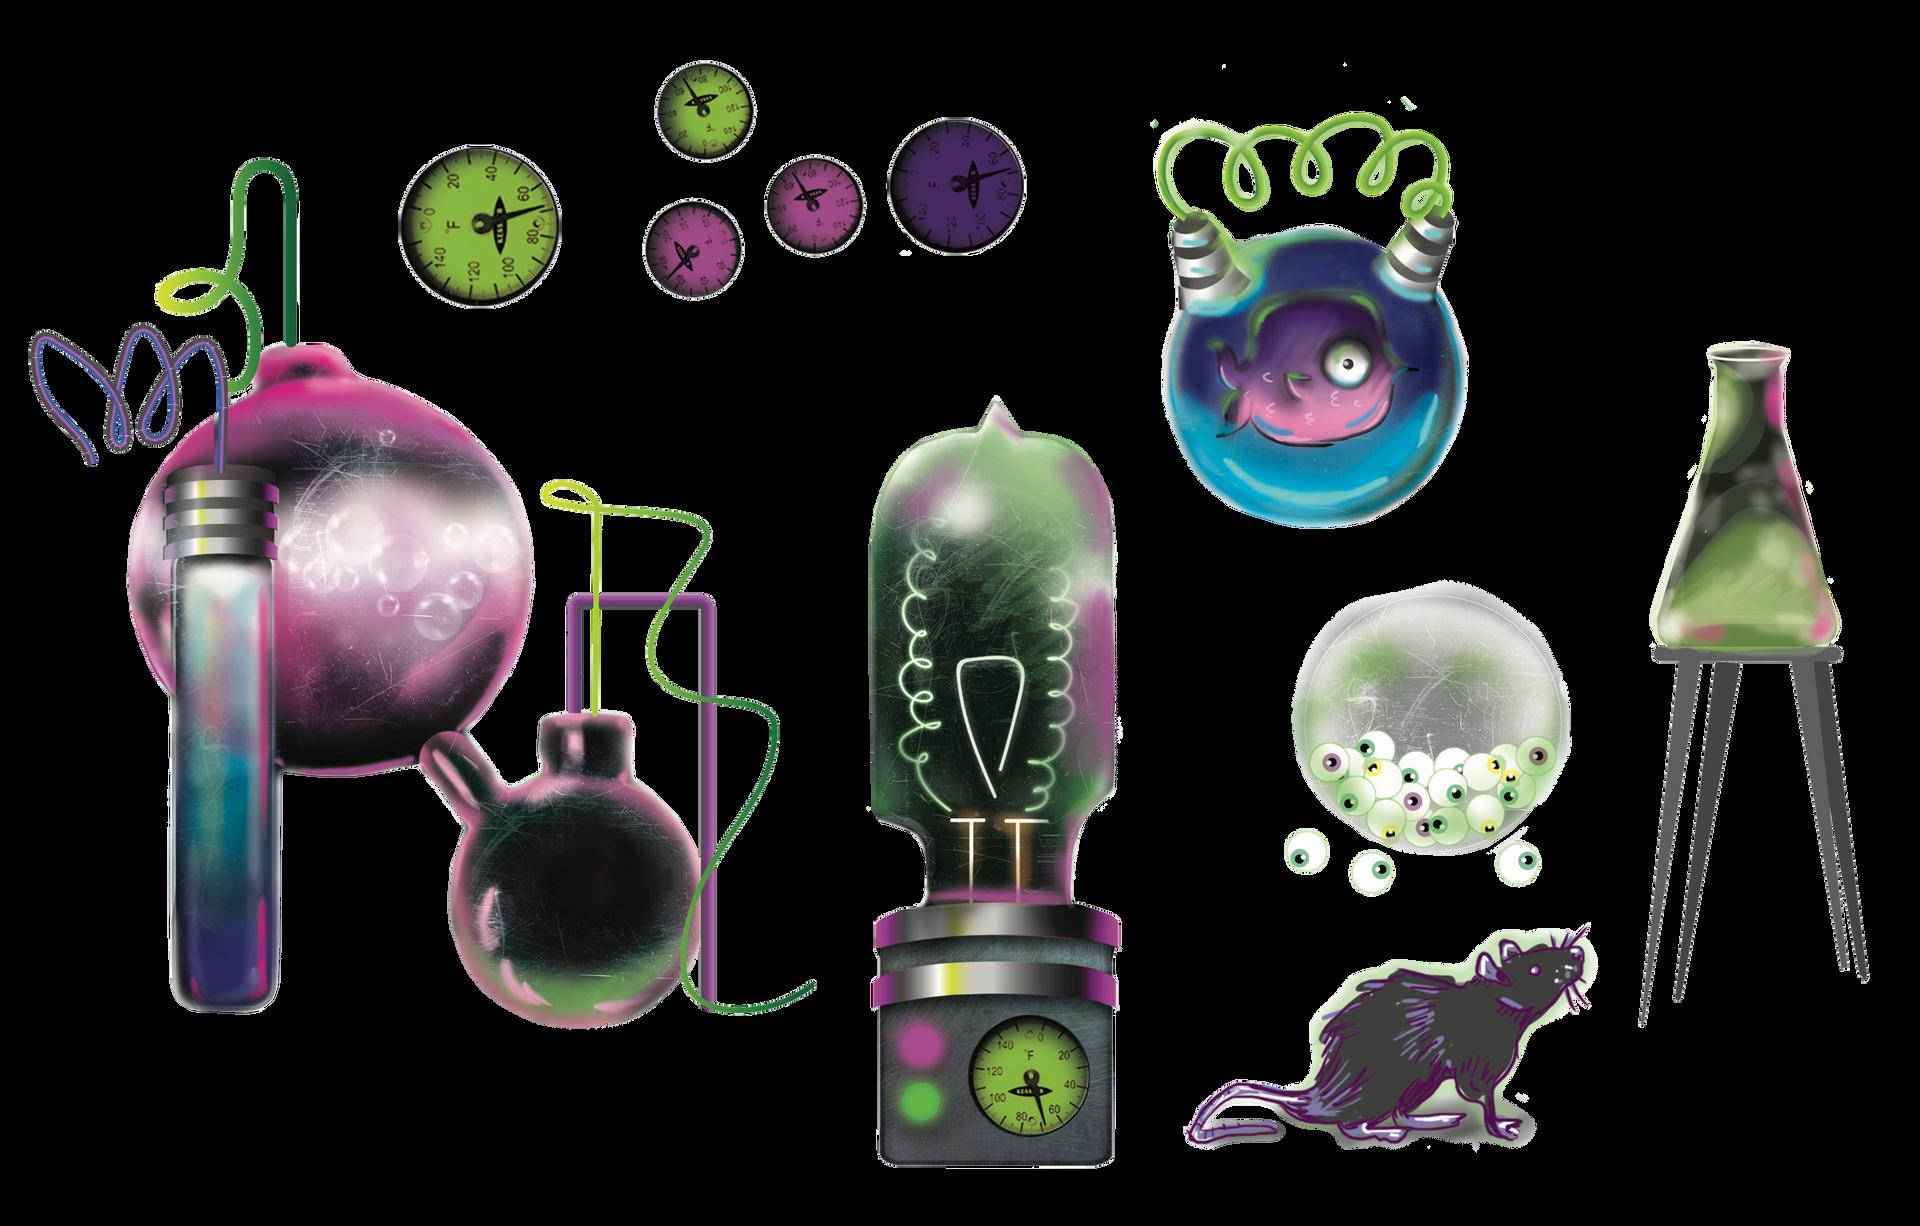 Mad Scientist Digital Art Elements Design For Halloween